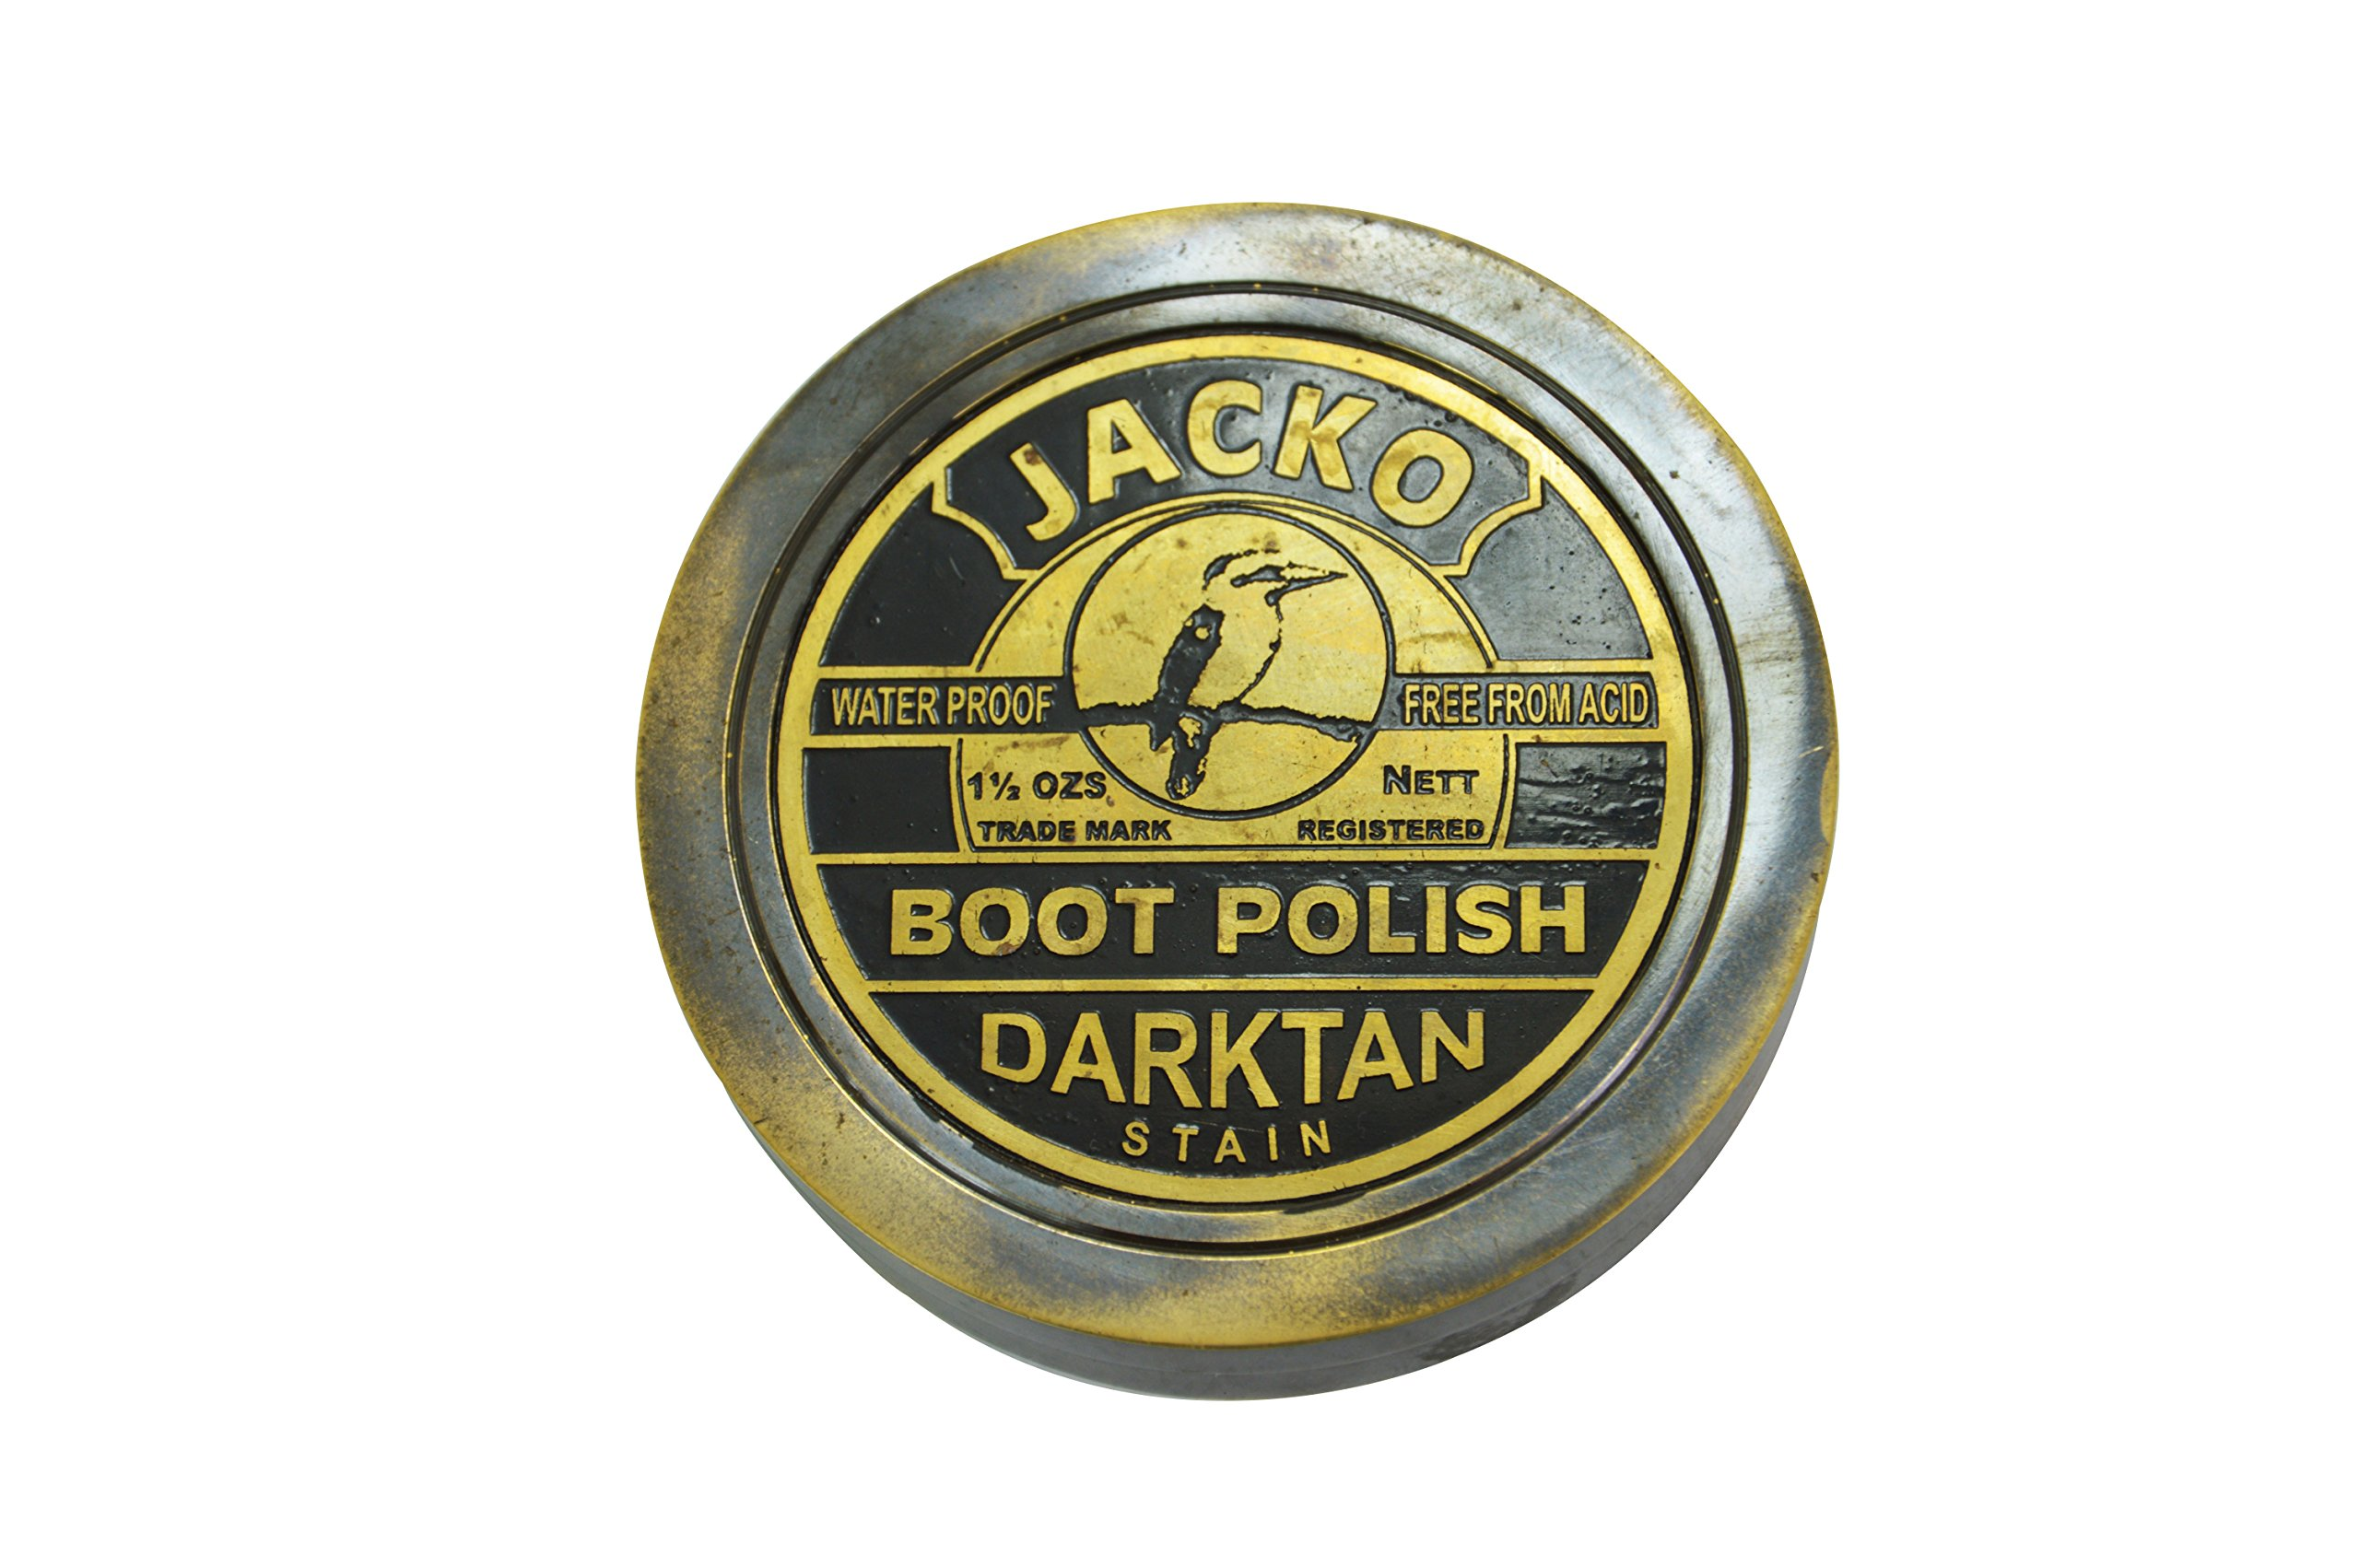 Boot Polish Handmade Poem Pocket Sundial Compass Collectibles Navigation 3'' Black